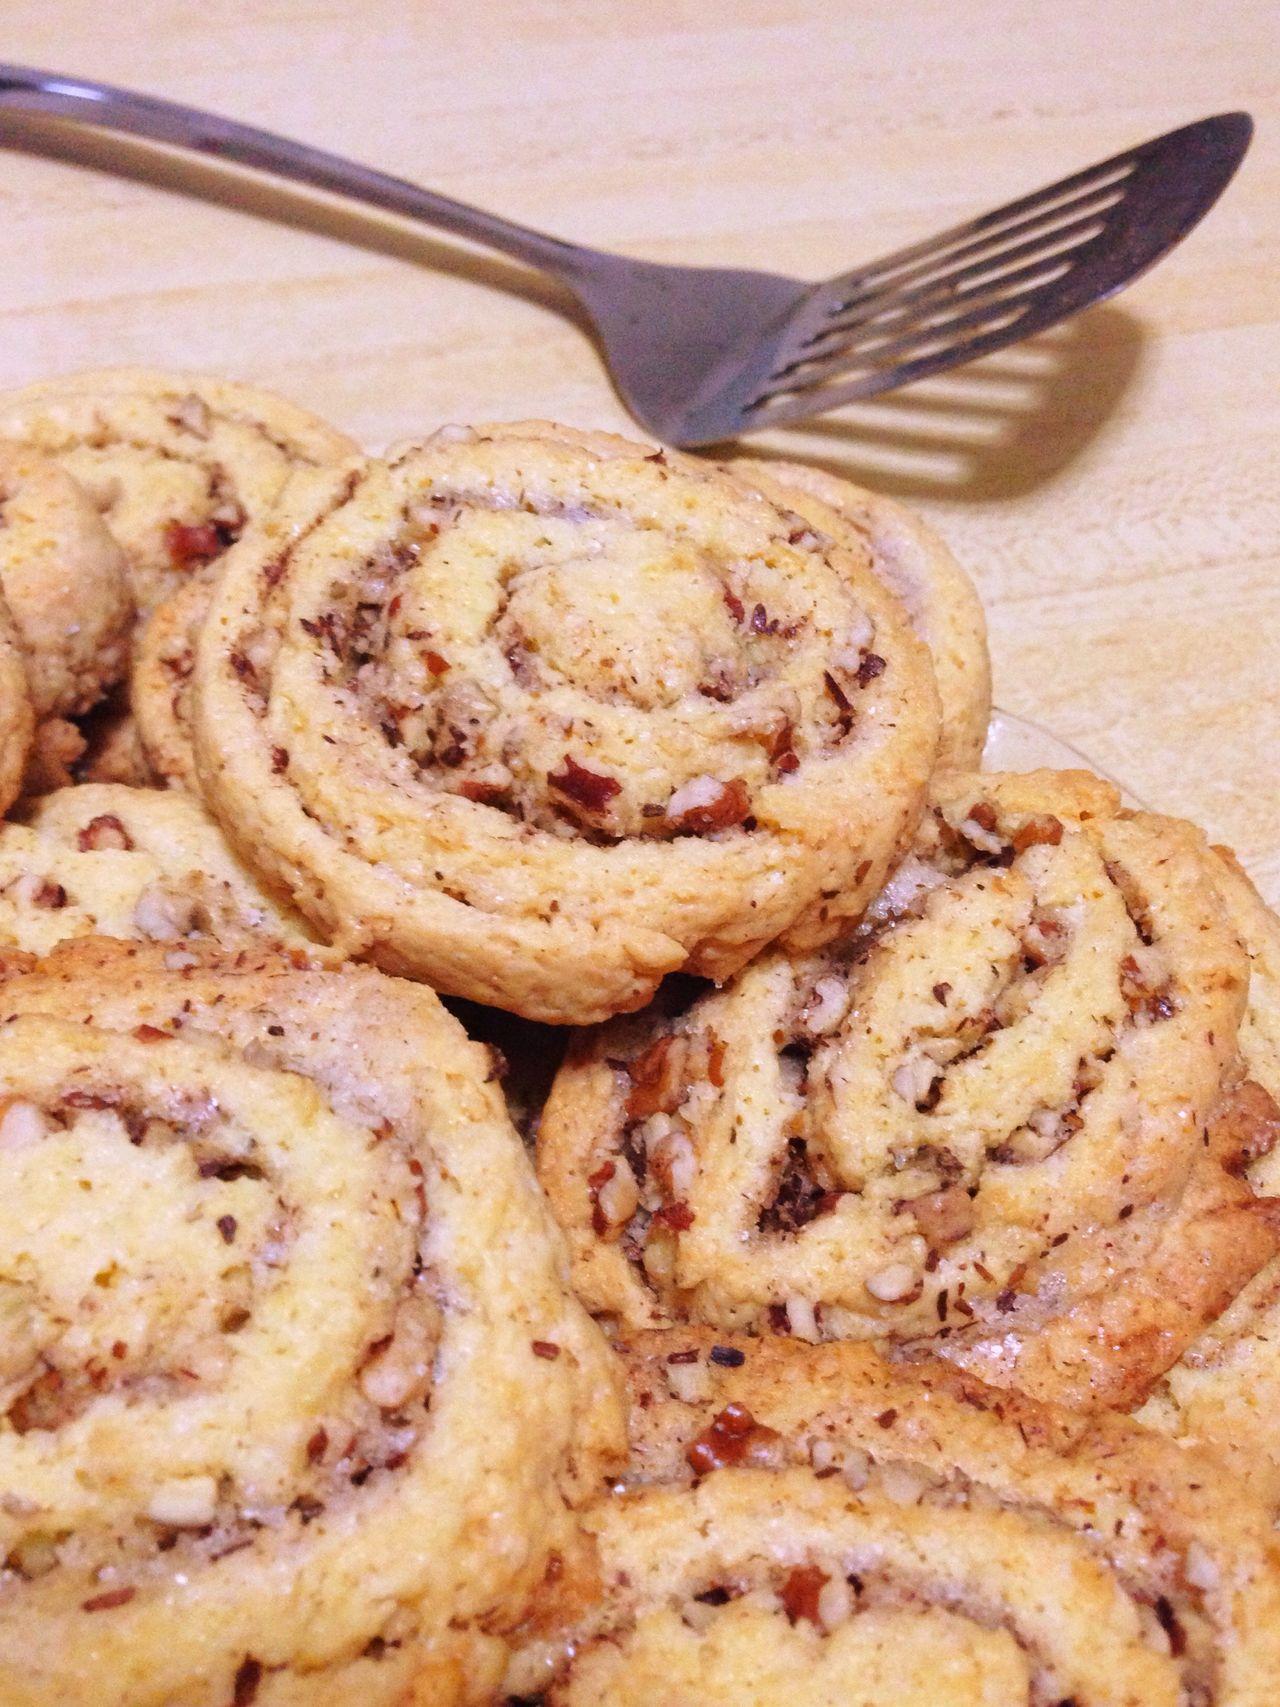 Beautiful stock photos of cookies, Brown, Pastel, Vertical Image, close-up